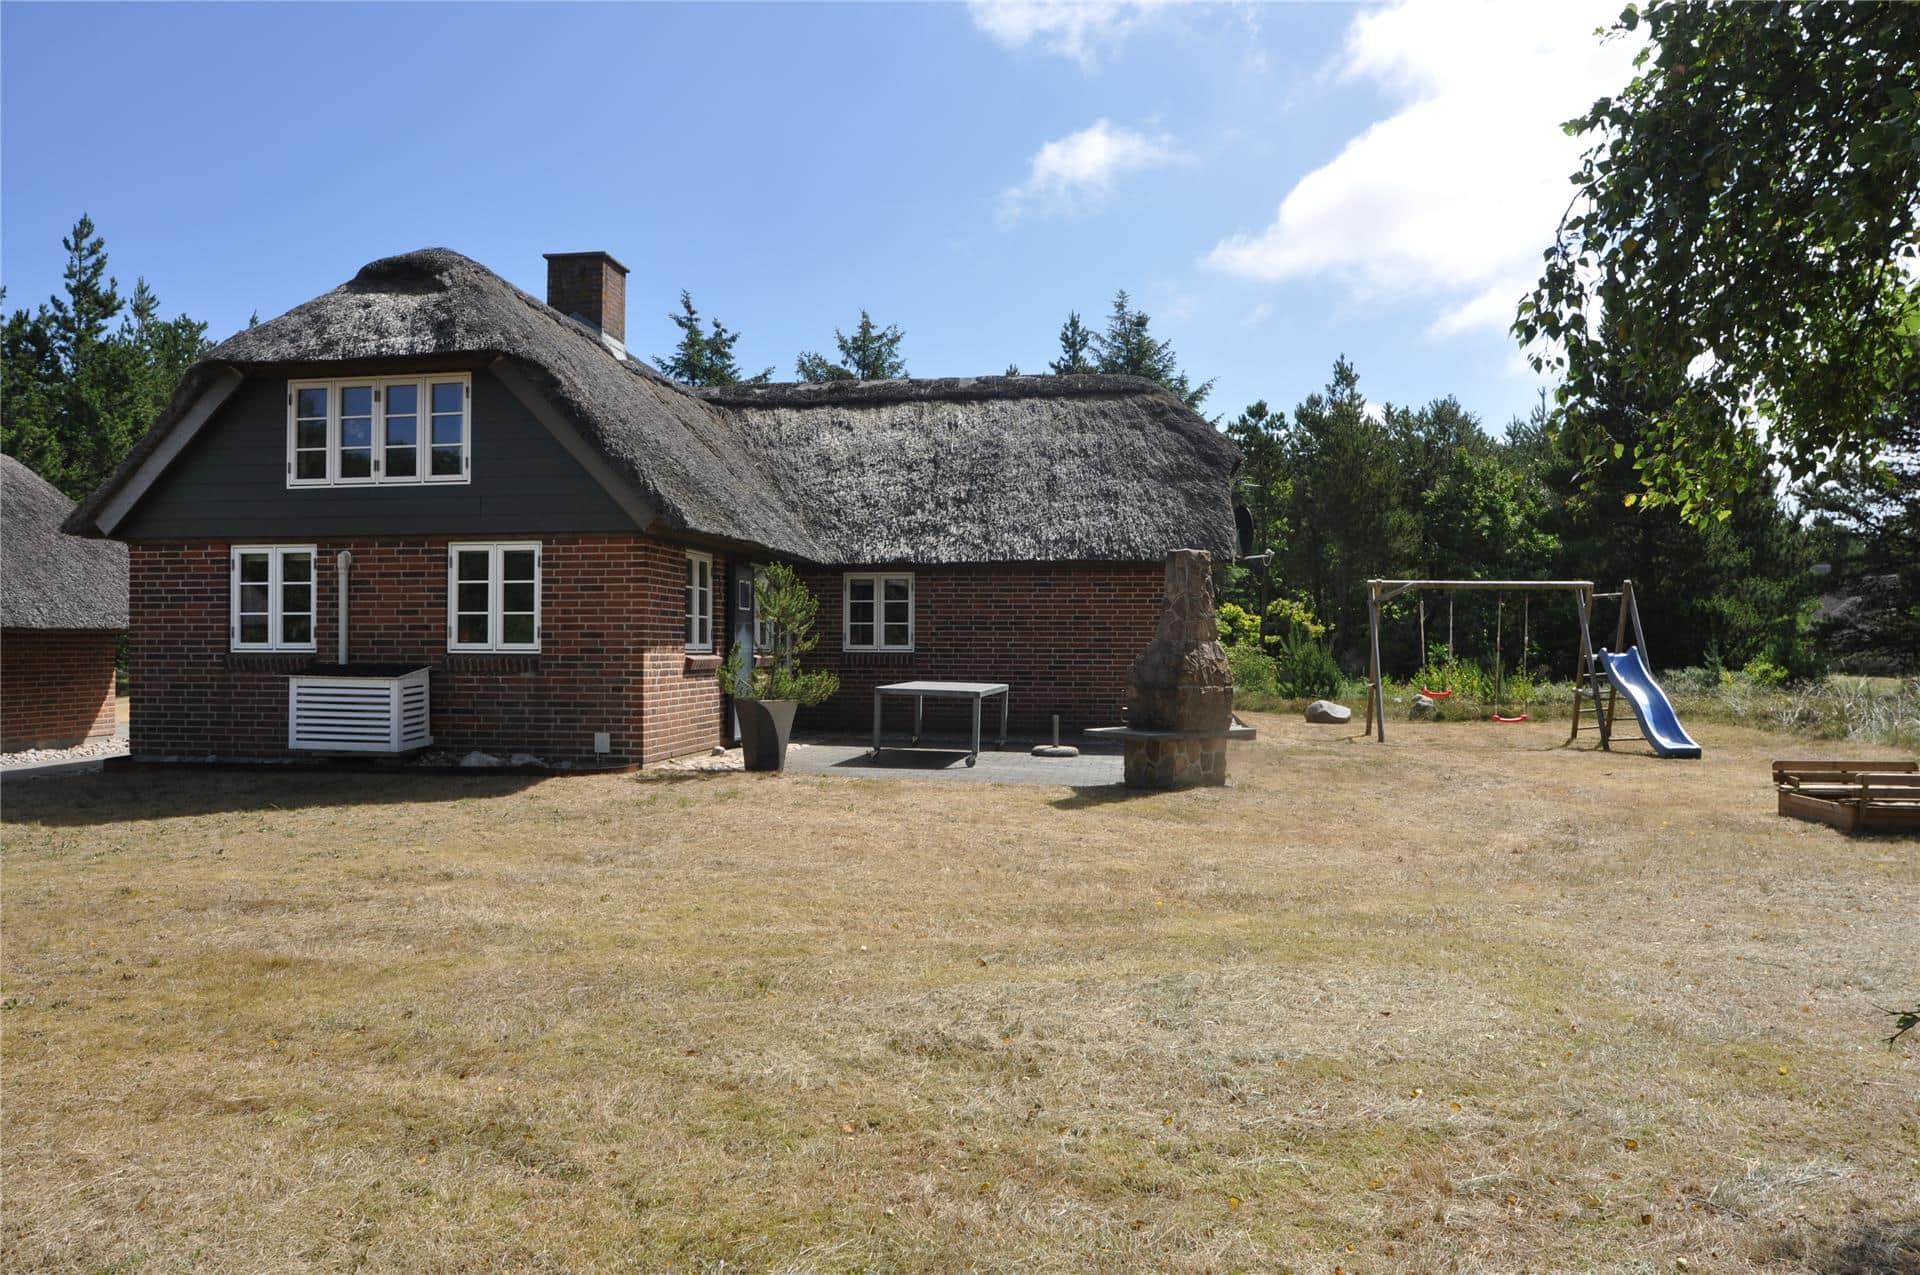 Billede 1-175 Sommerhus 10019, Gaffelbjergvej 18, DK - 6990 Ulfborg